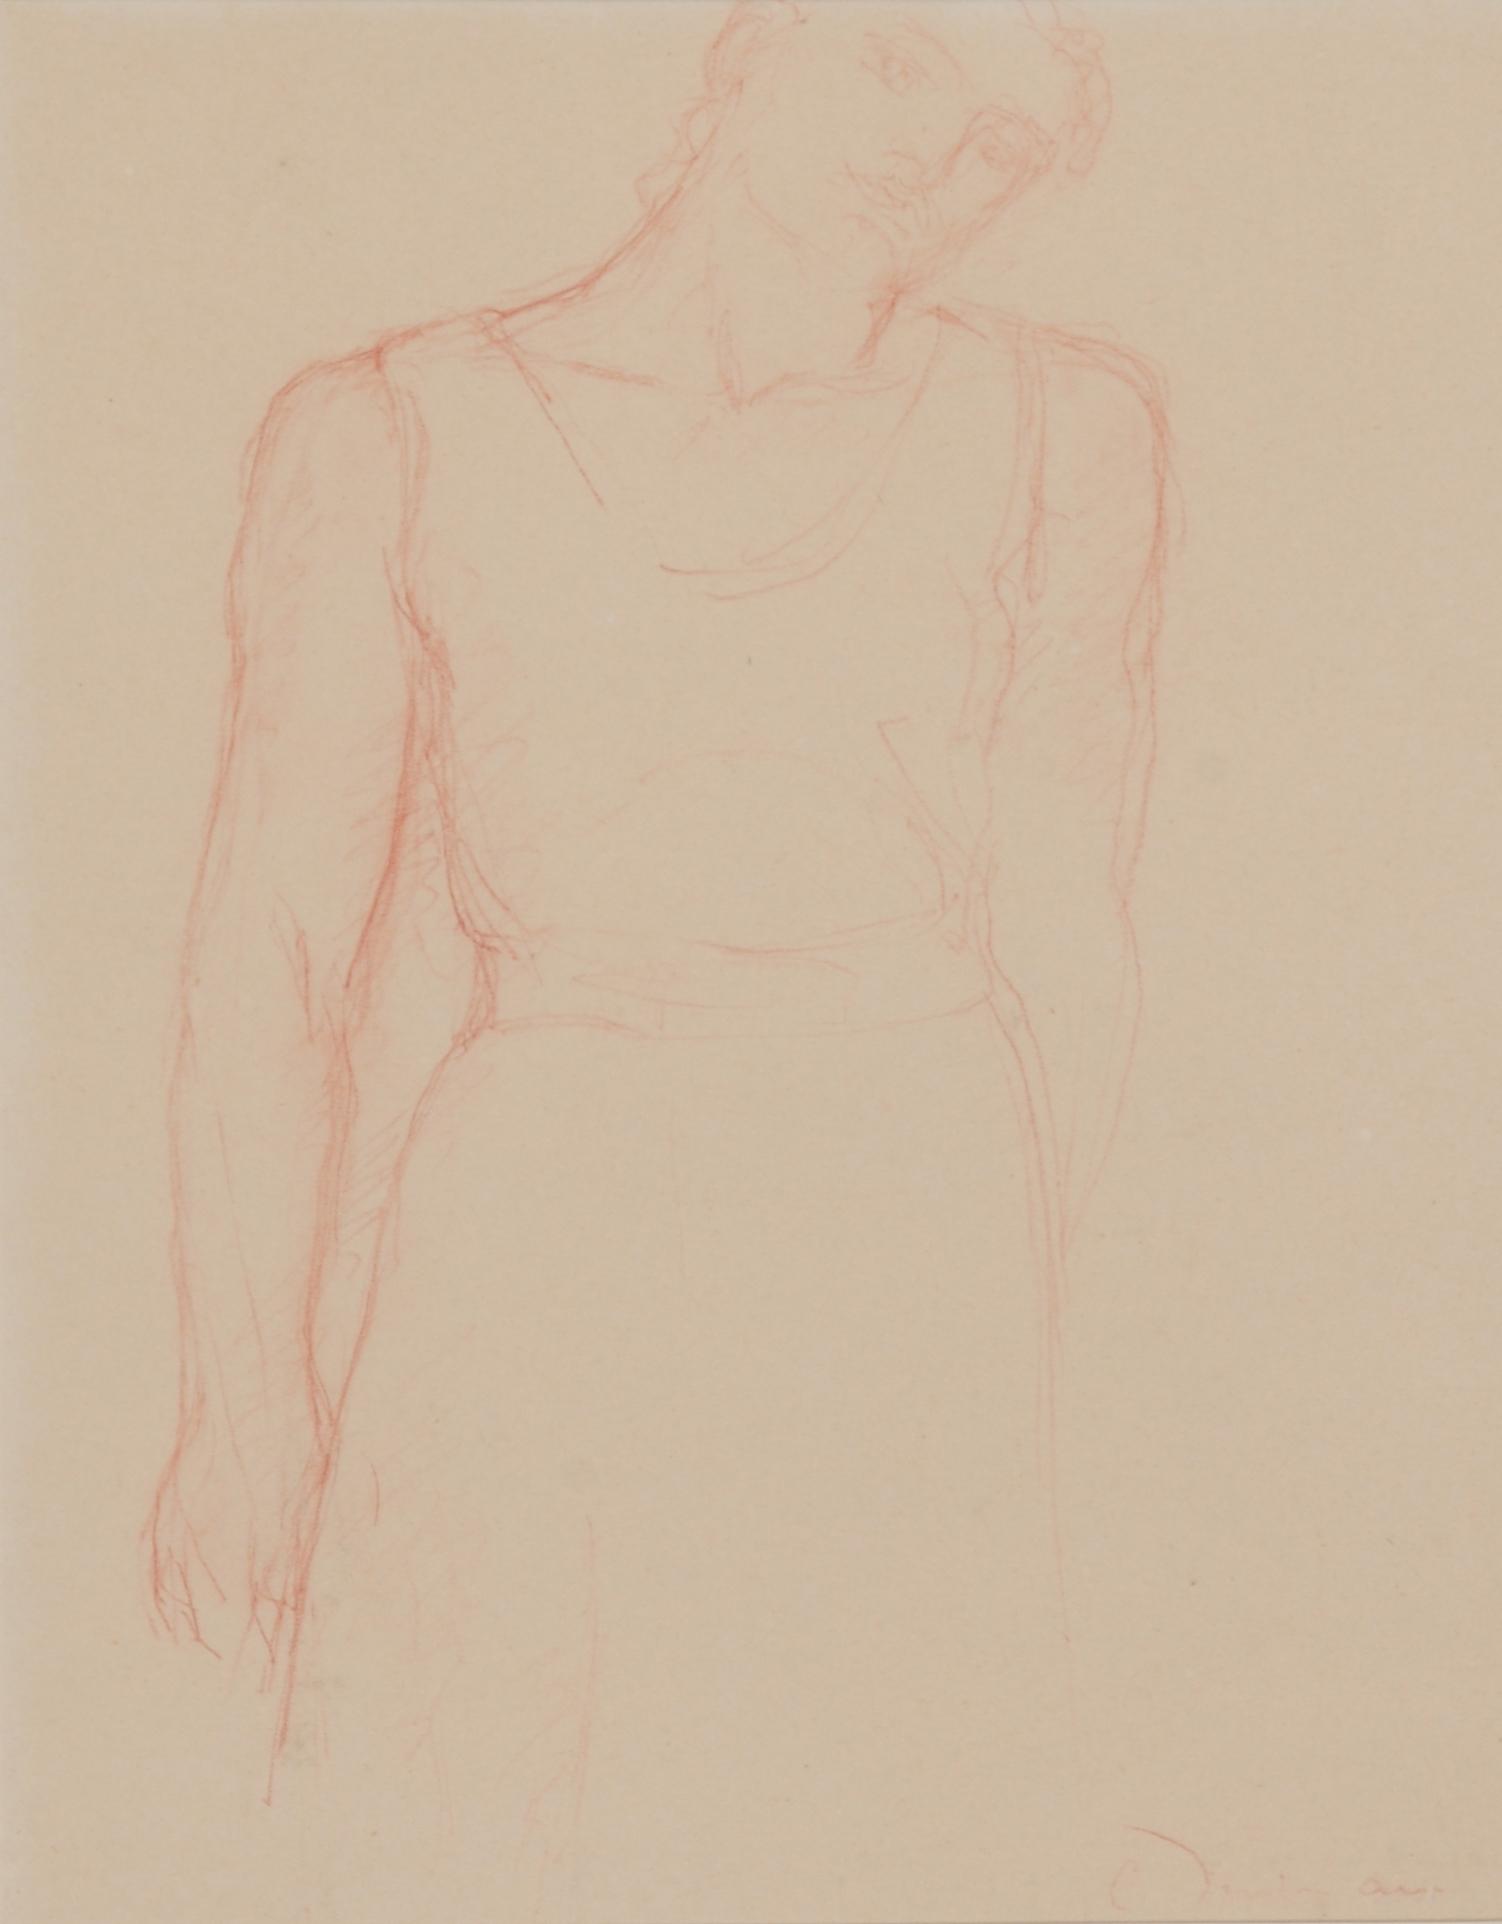 Despiau Charles, 2 drawings: Femme allongée; Femme debout